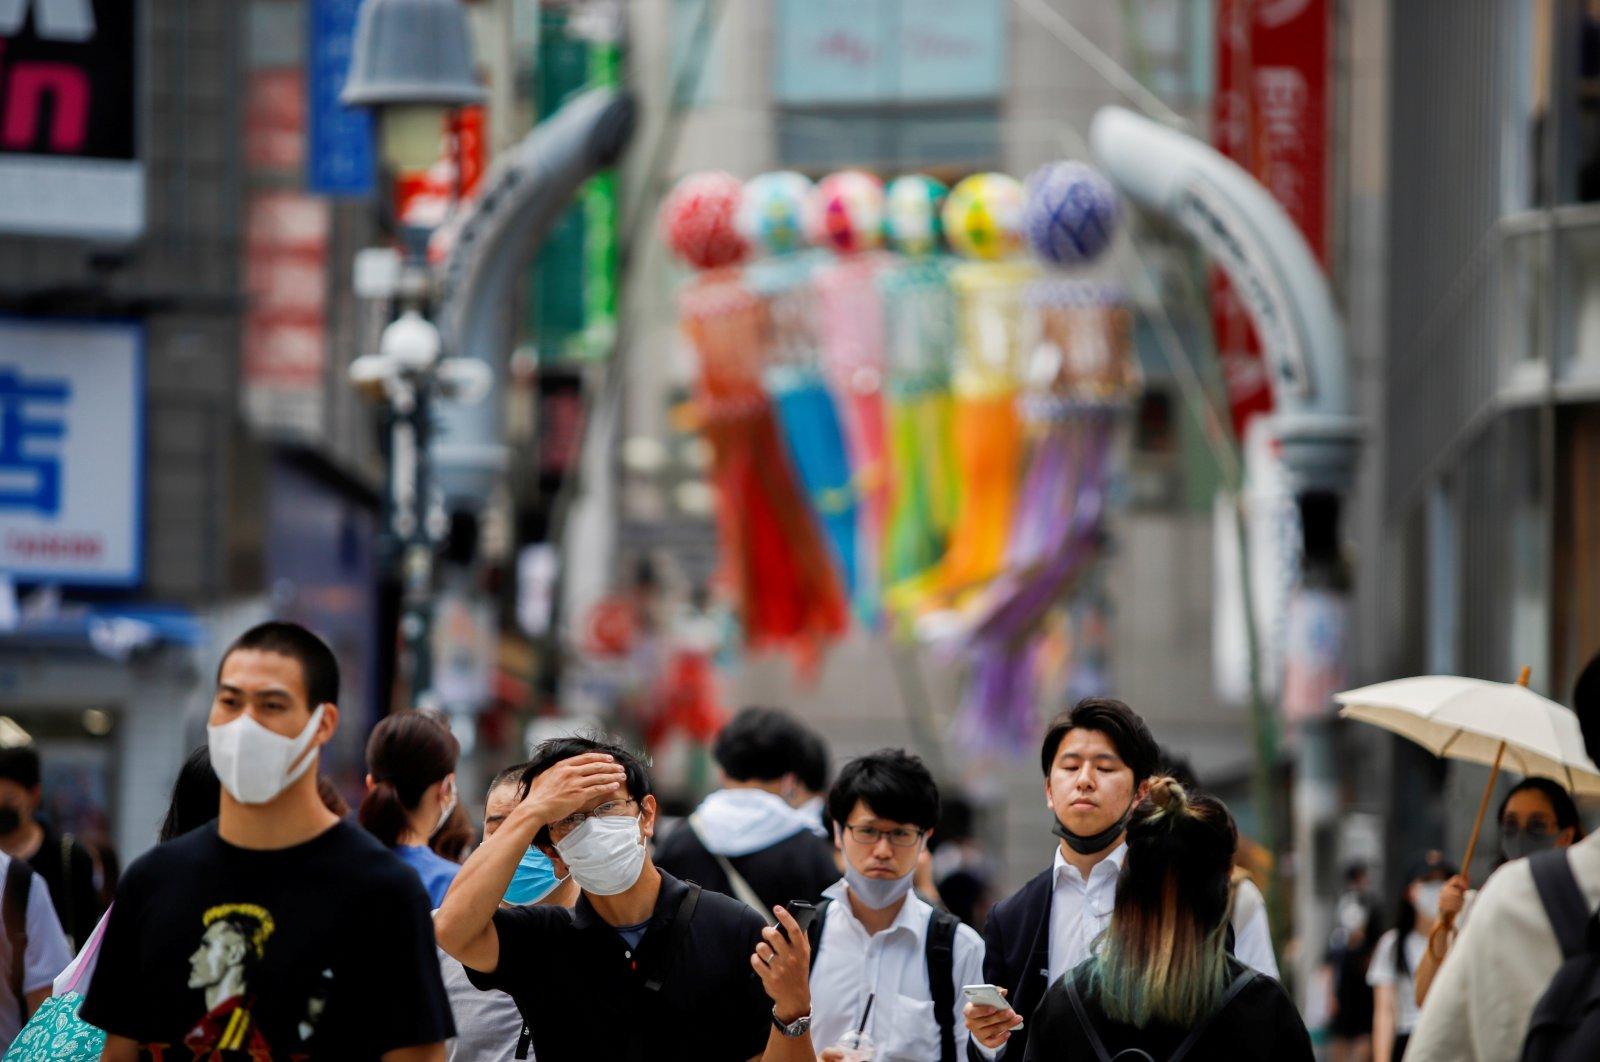 People walk at the Shibuya crossing in Tokyo, Japan, July 29, 2021. (Reuters Photo)